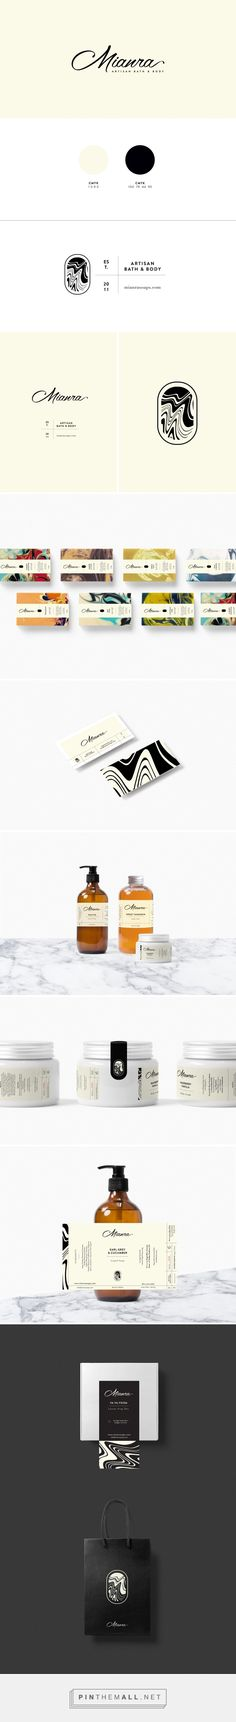 Mianra Artisan Bath & Body Branding by Cocorrina | Fivestar Branding – Design and Branding Agency & Inspiration Gallery